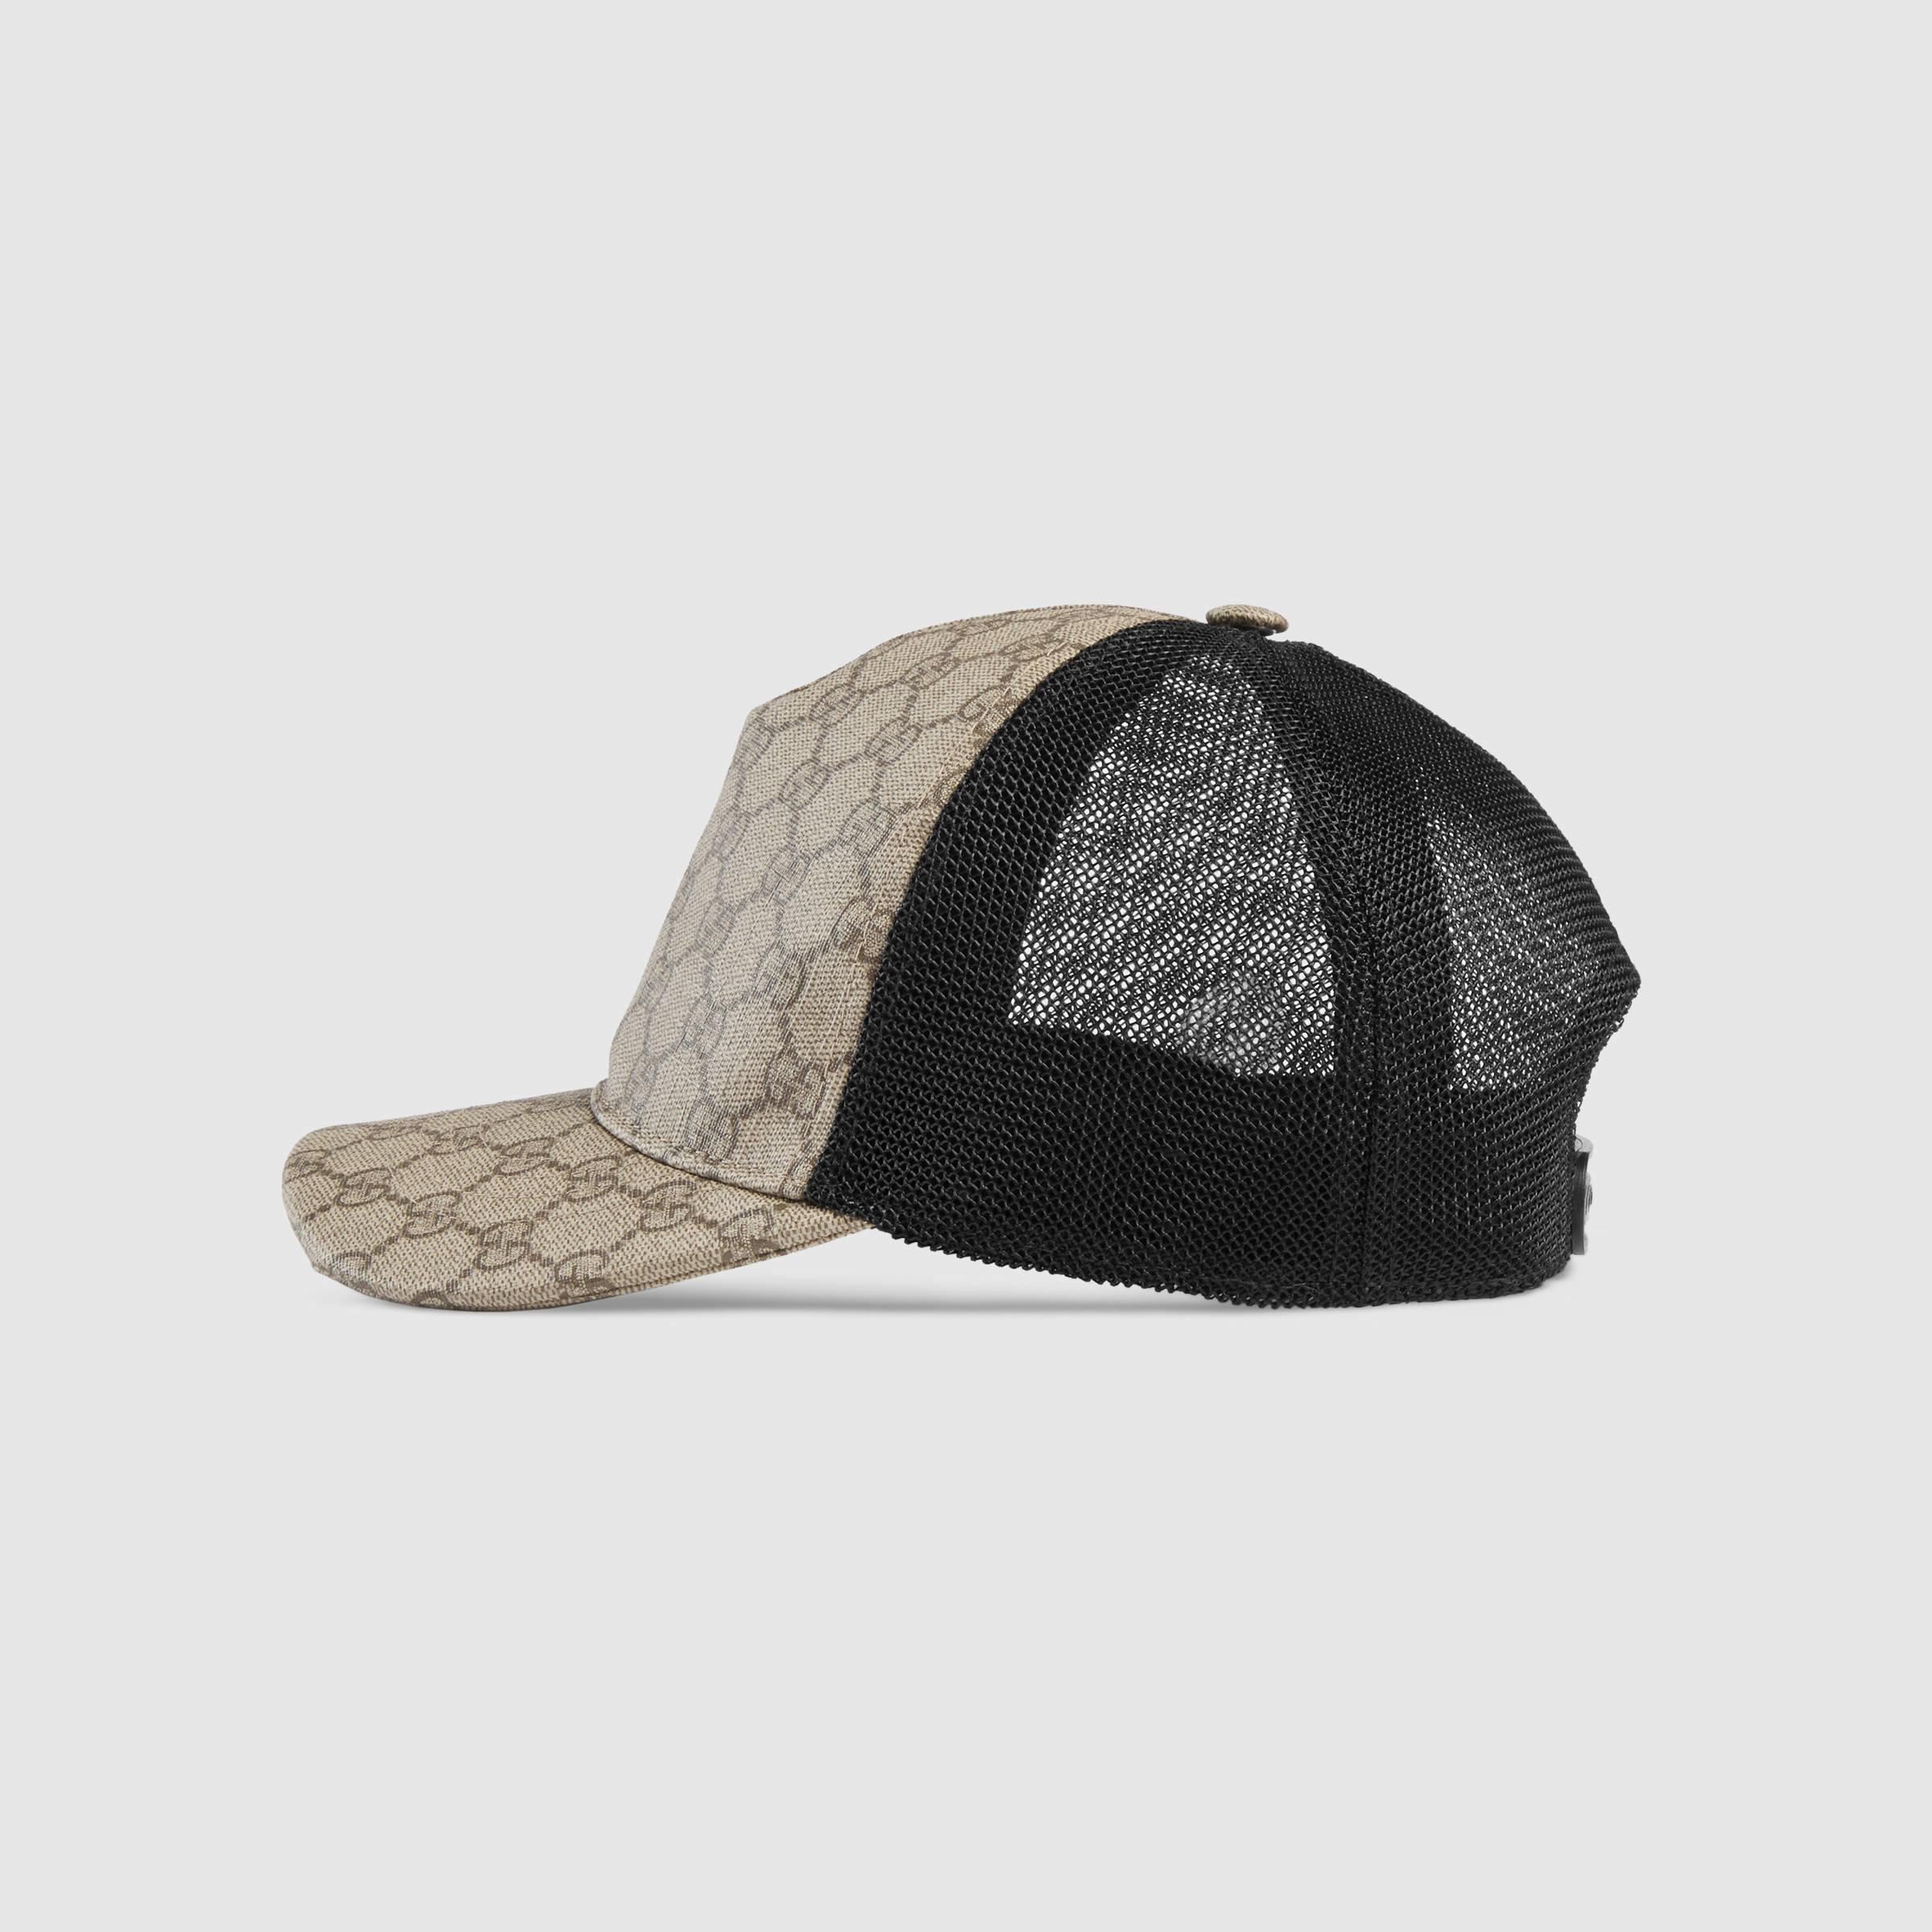 Gucci Gg Supreme Baseball Hat For Men